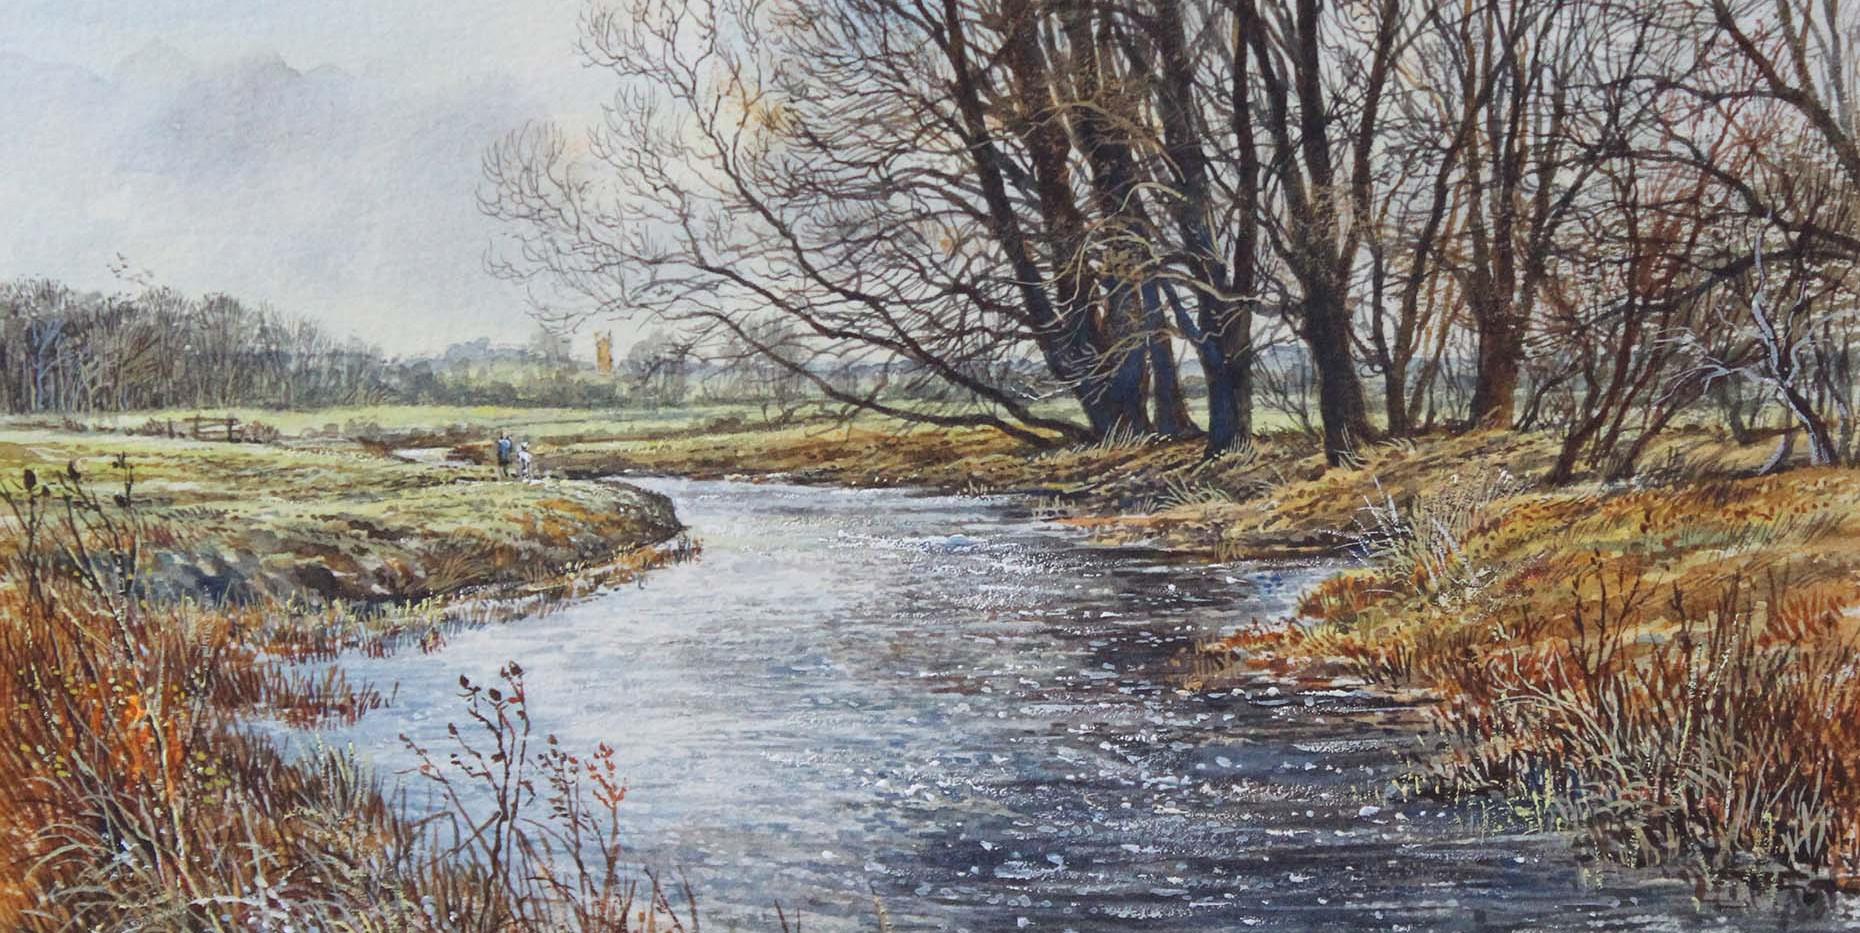 River Nene at Doddington 25cm x 17cm.jpg